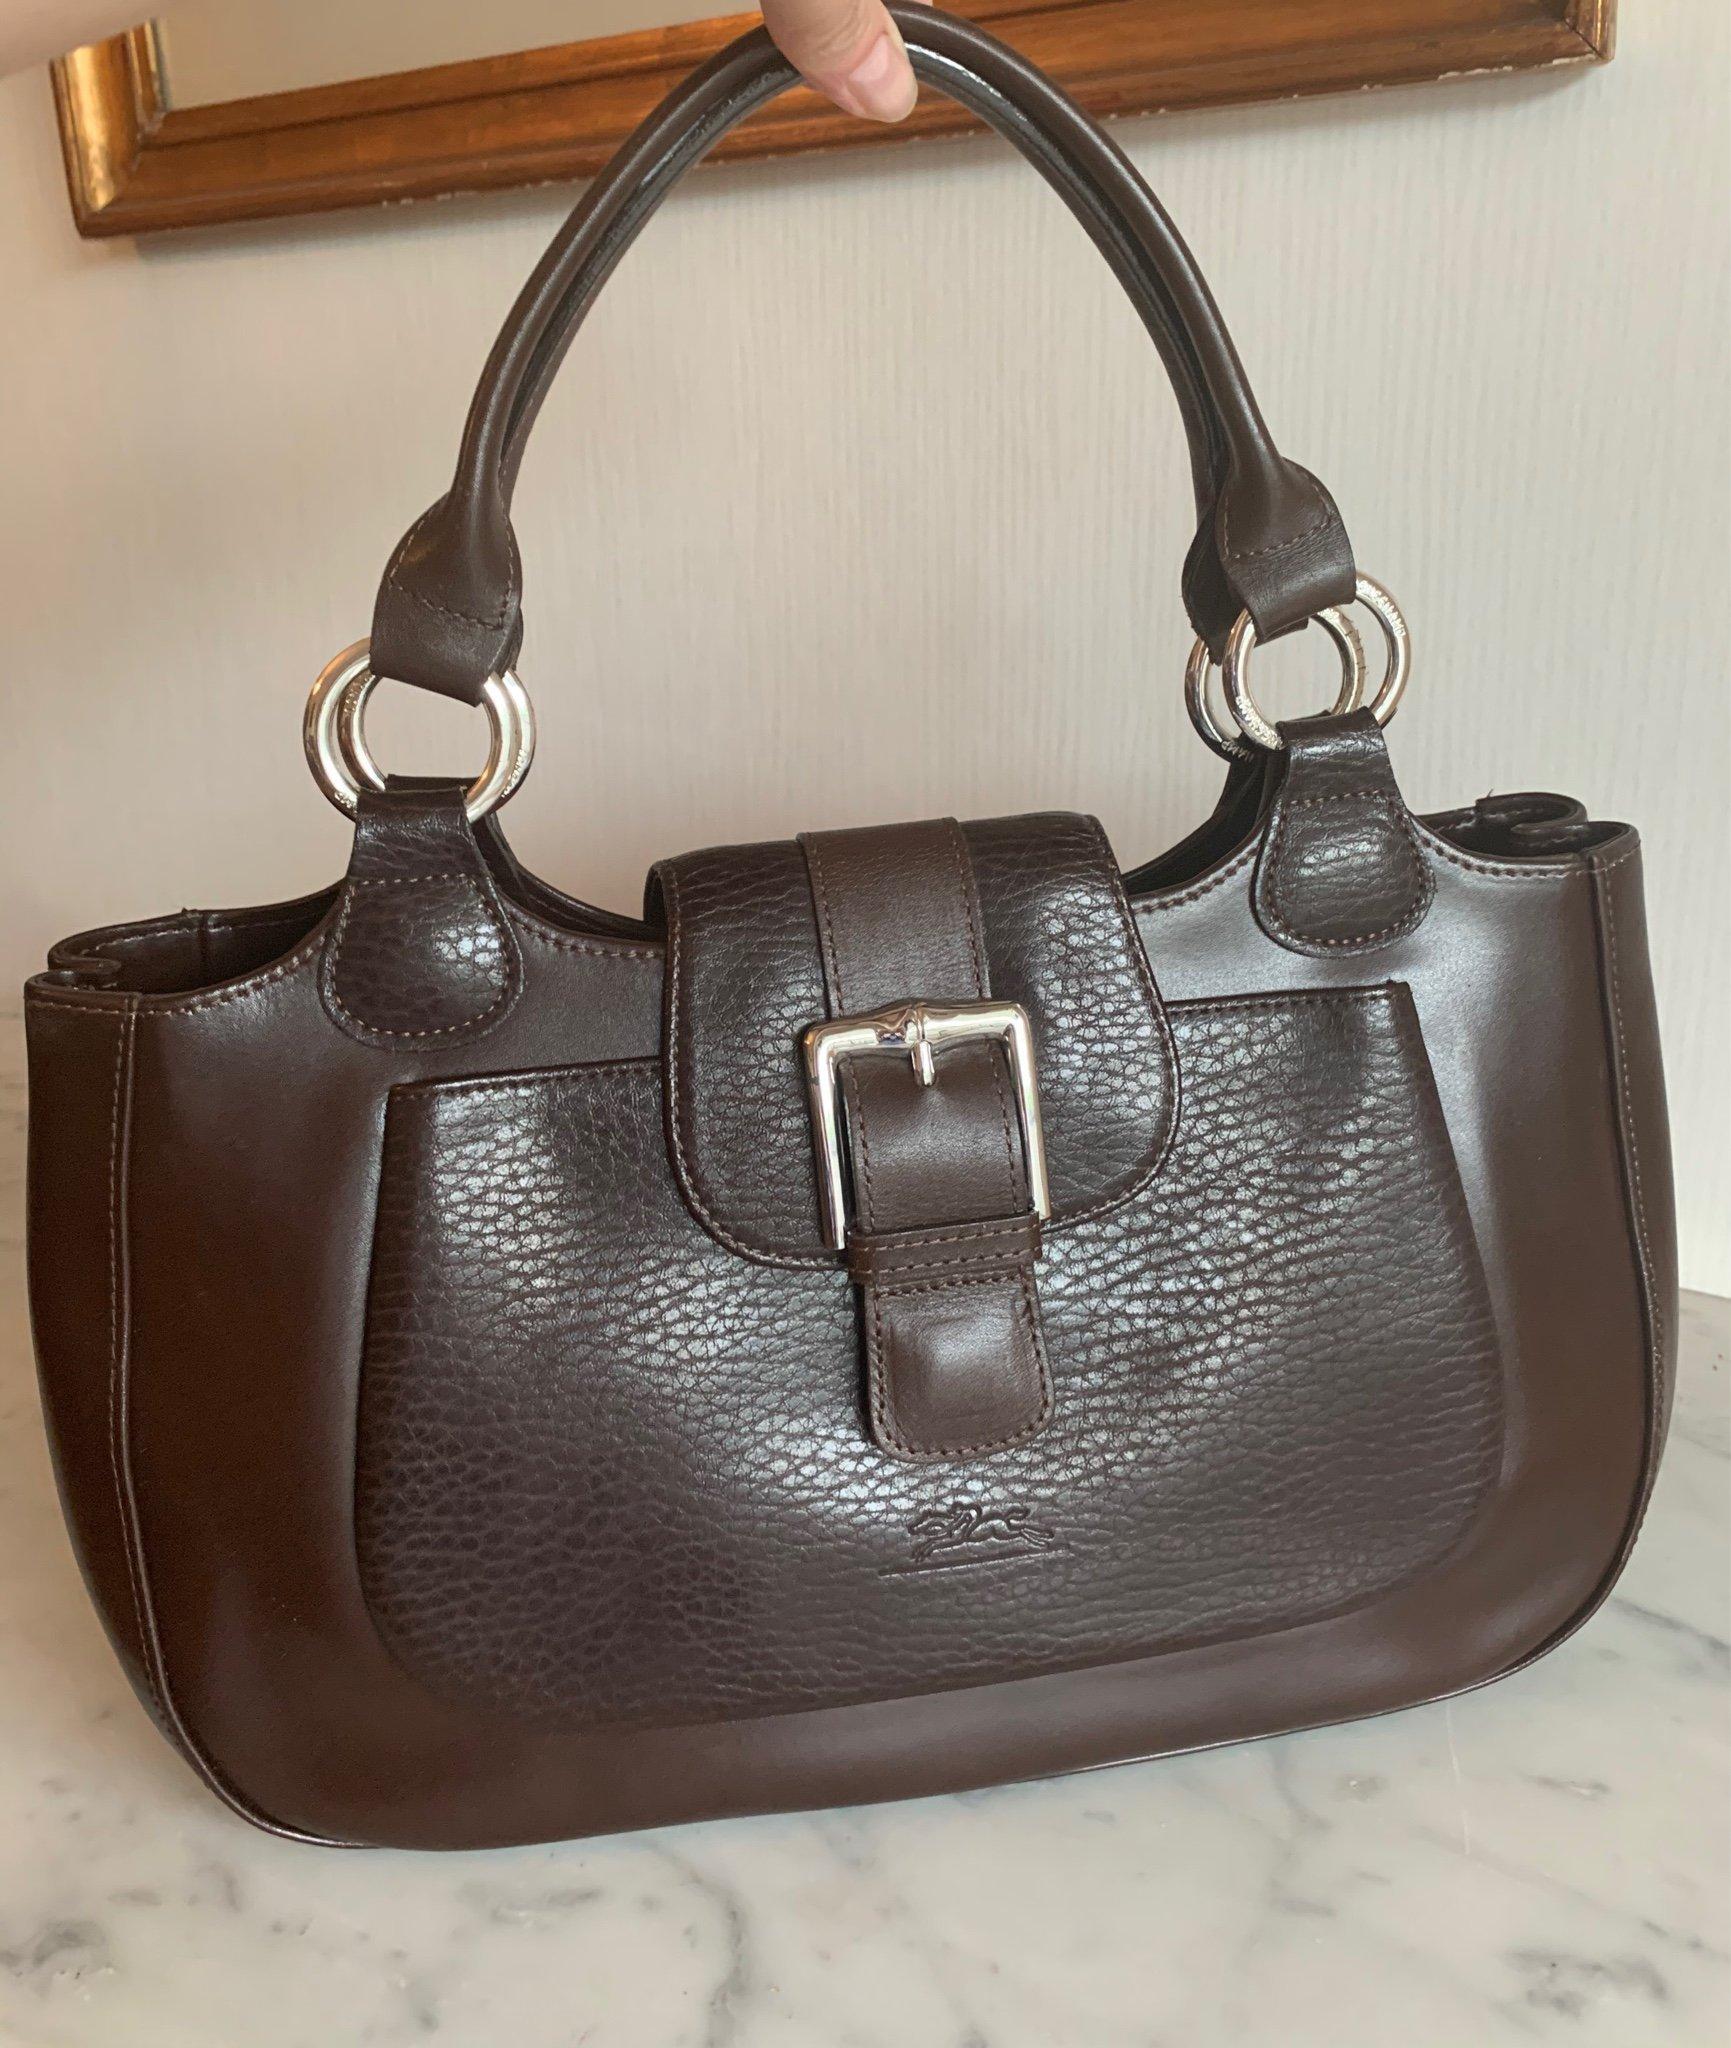 LONGCHAMP väska i brunt skinn